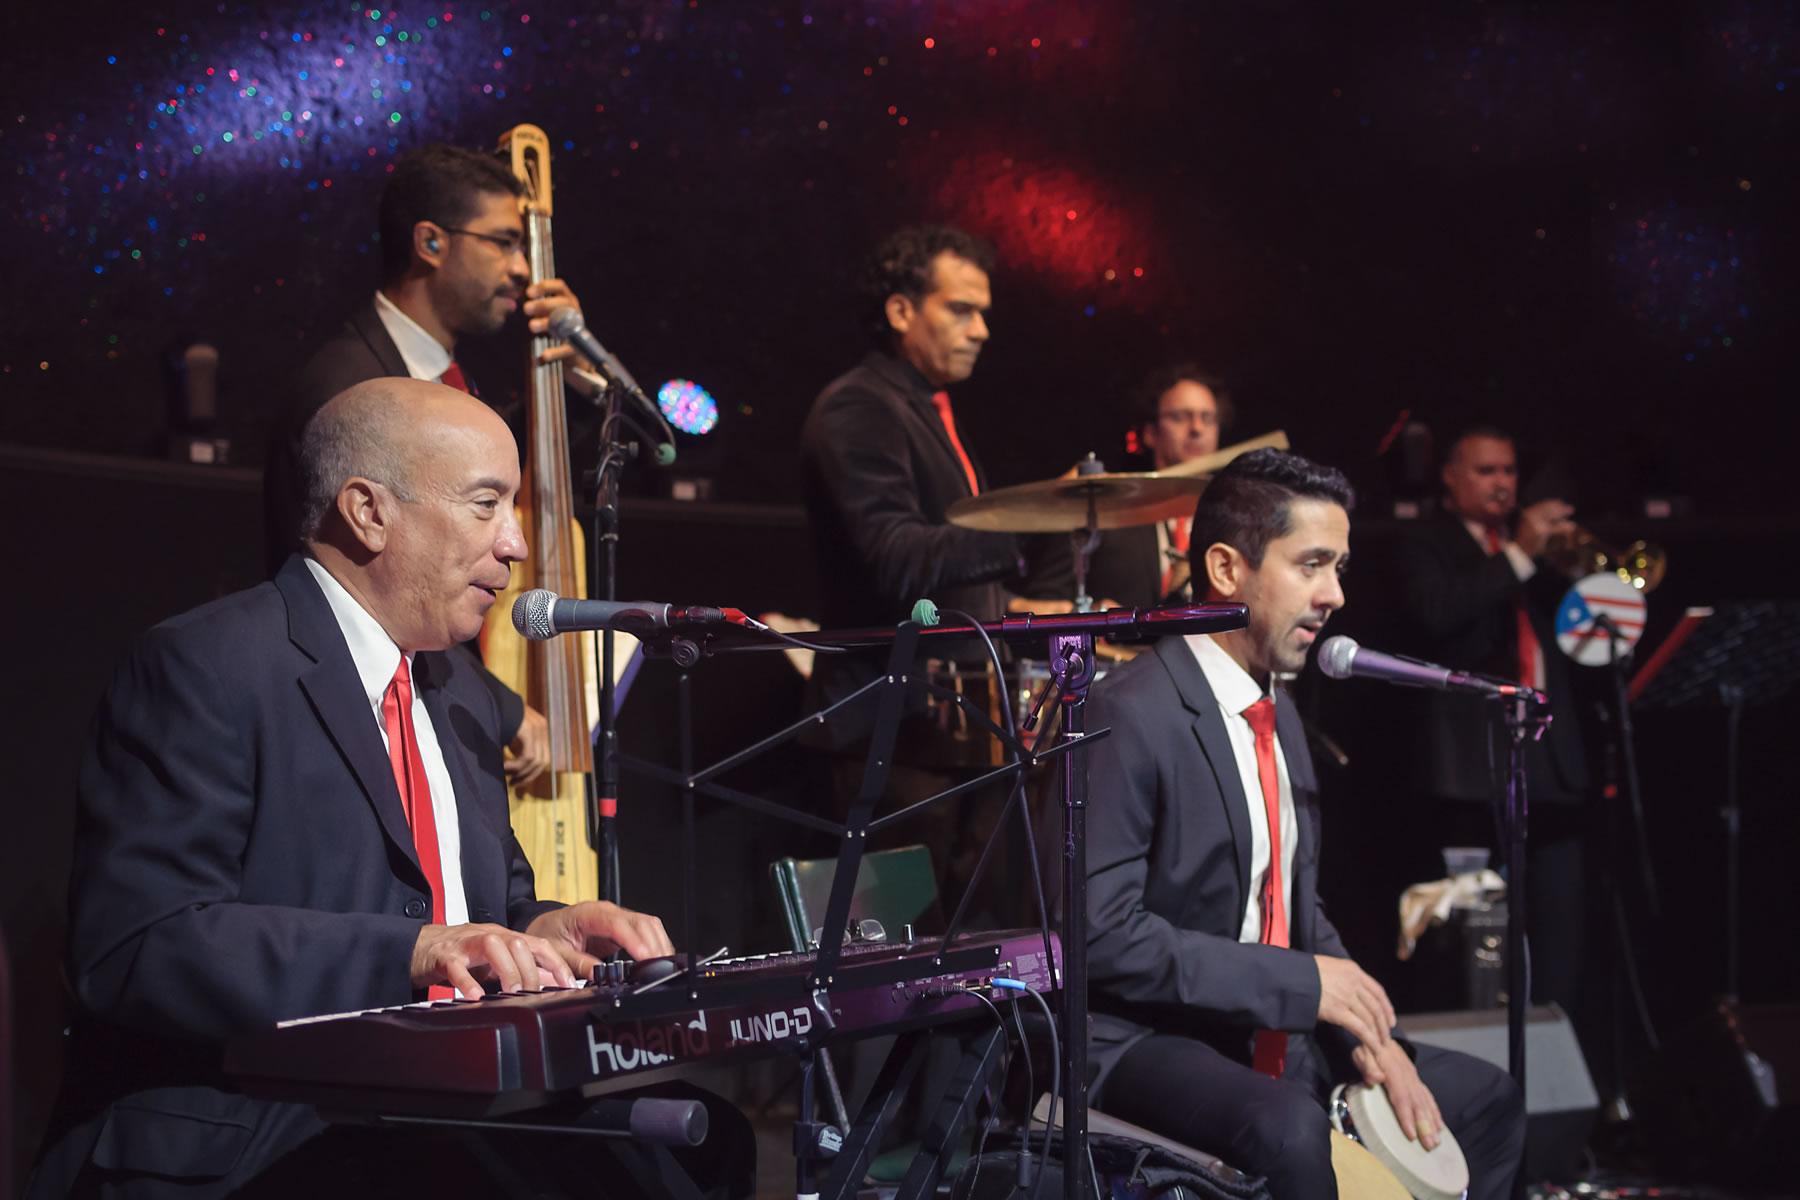 Sonido Costeno-orchestra-relief-layered-picture-Empire-City-Yonkers-Raceway-Casino-concert